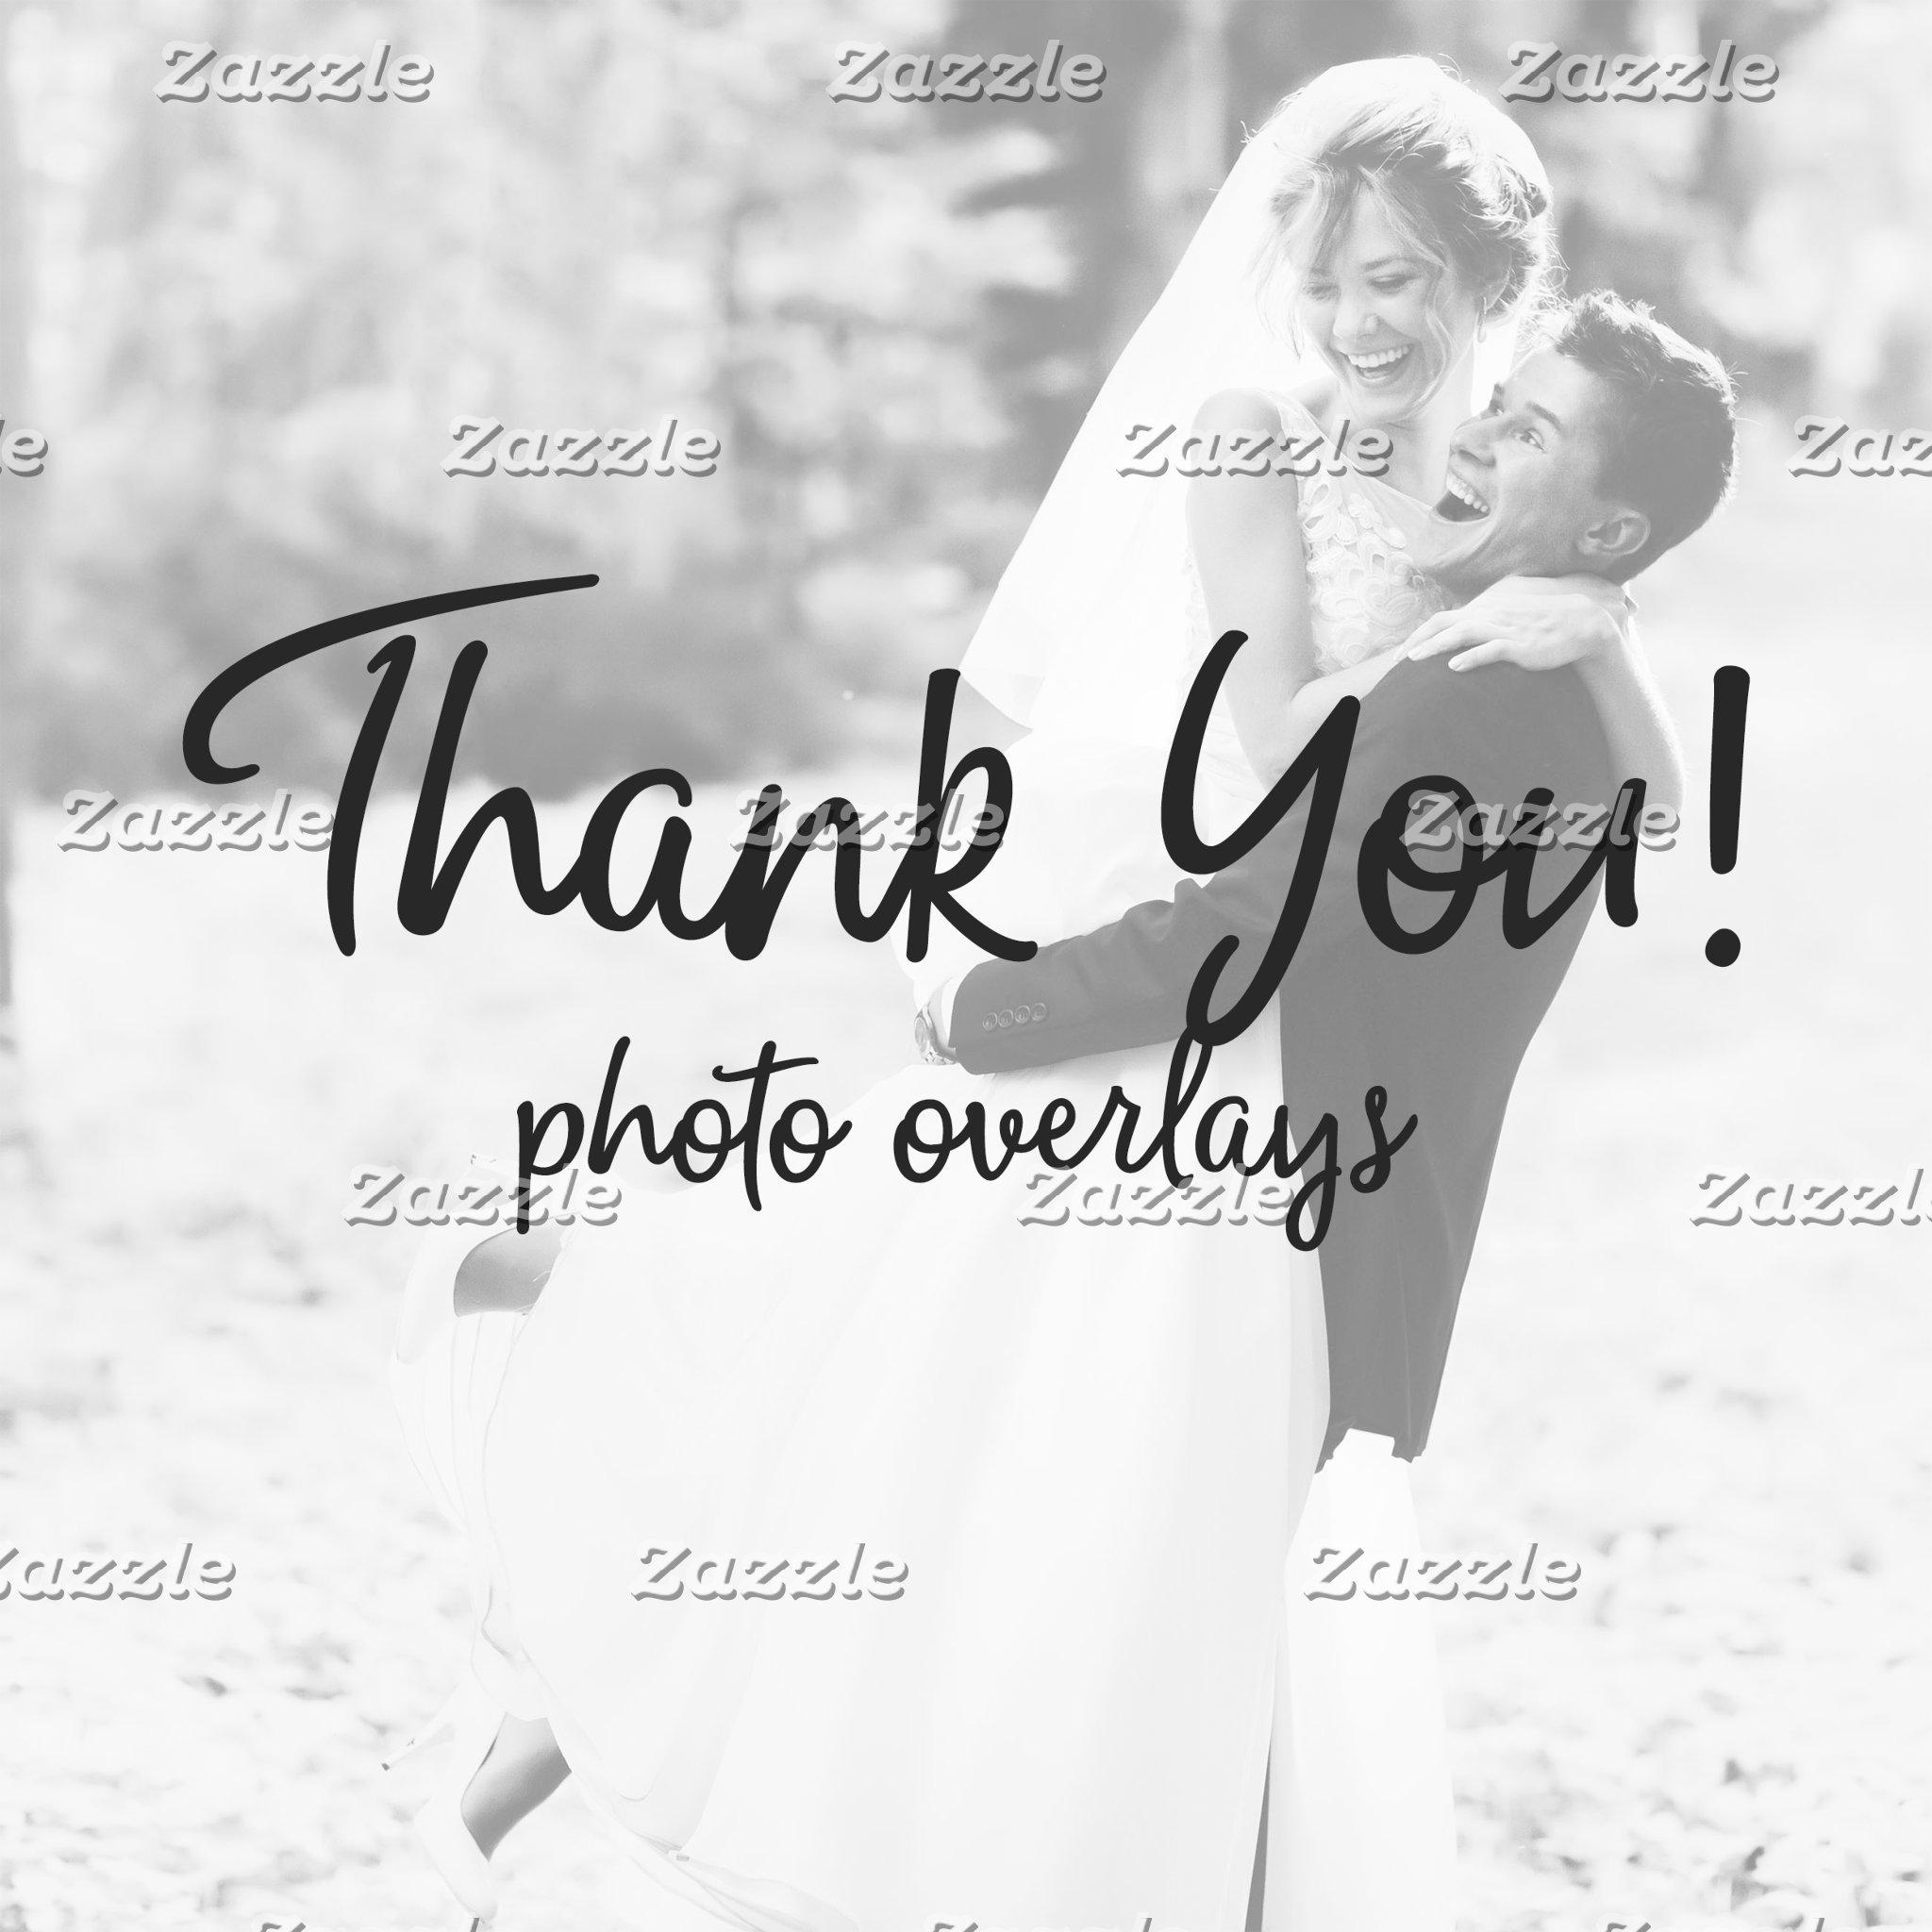 Thank You Photo Overlay